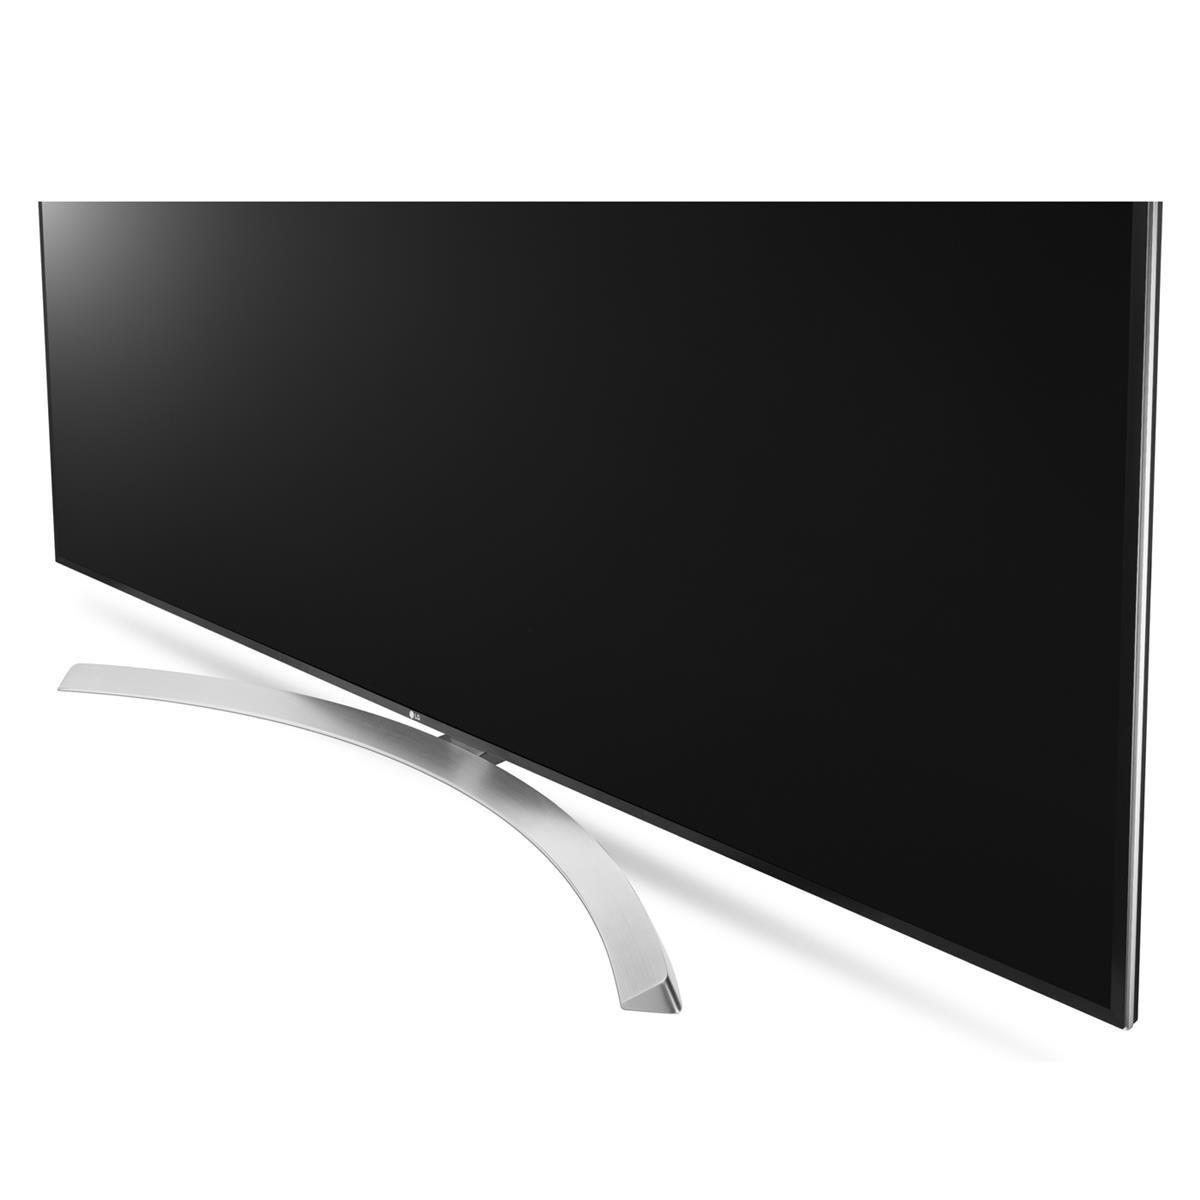 Lg Electronics 86uh9500 86 Inch 4k Ultra Hd Smart Led Tv Diagram Movement Color Remote 2016 Model